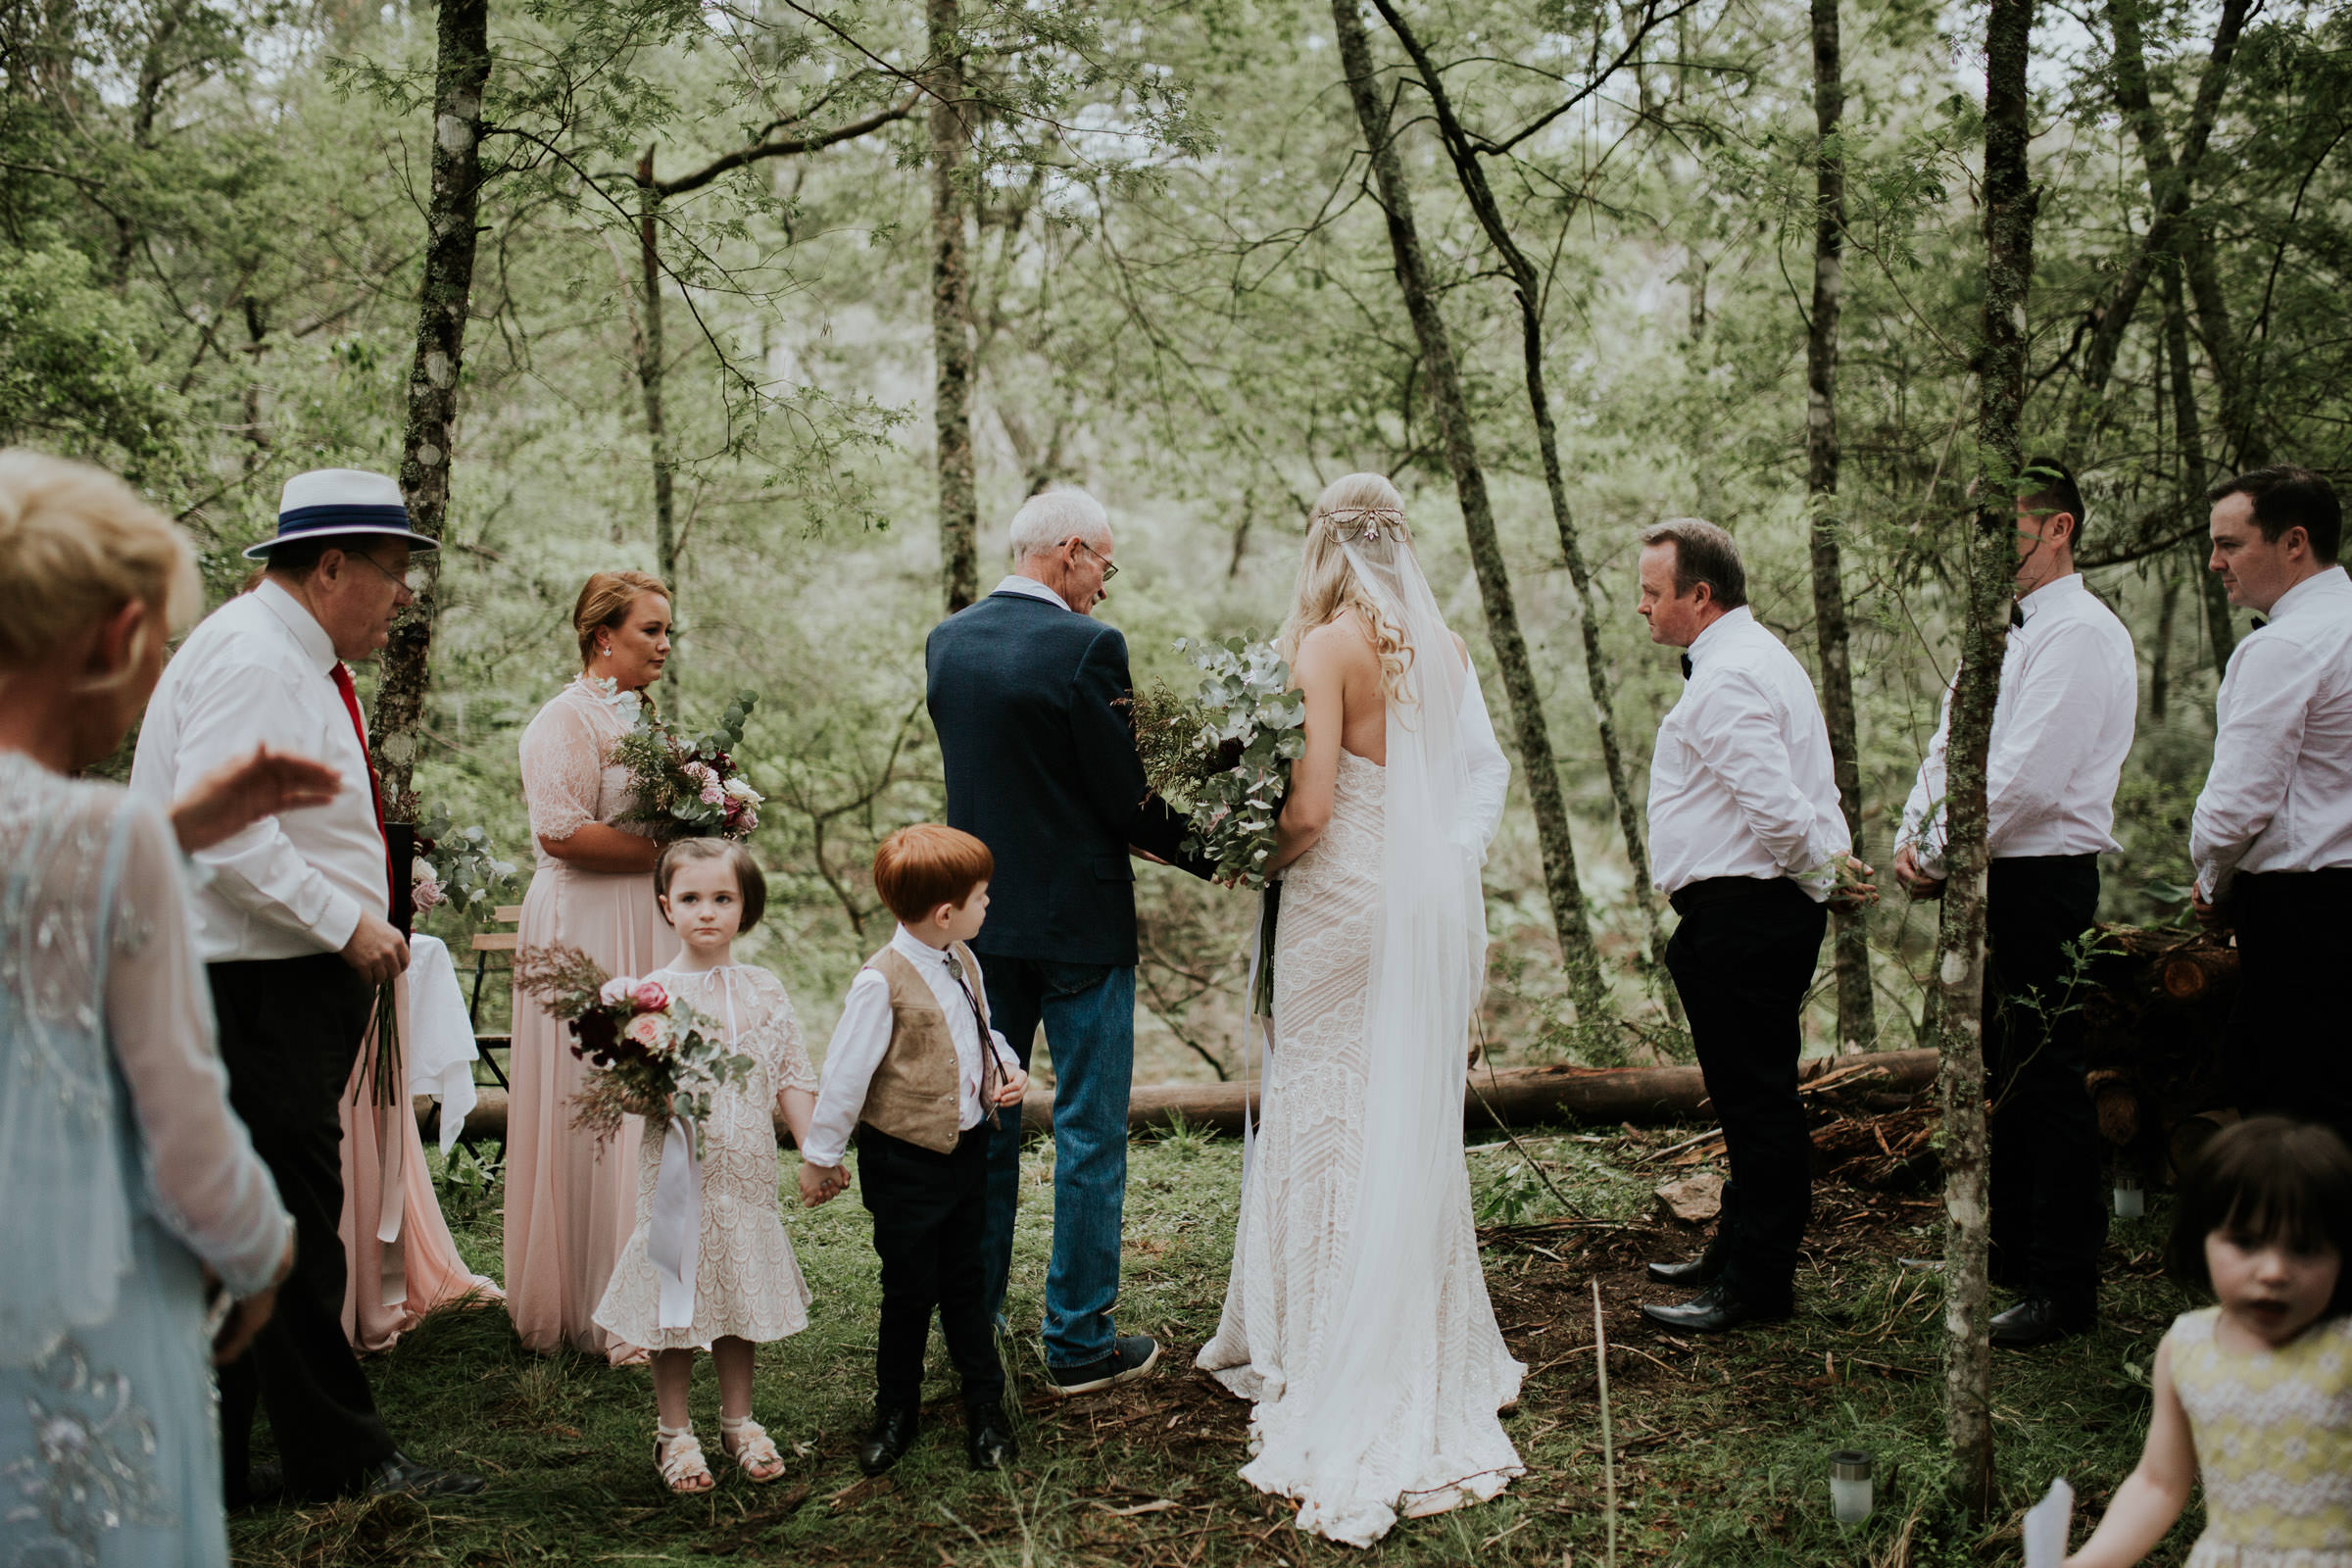 Emma+John+Far+South+Coast+Wedding+Festivl+Glamping+Bush-99.jpg